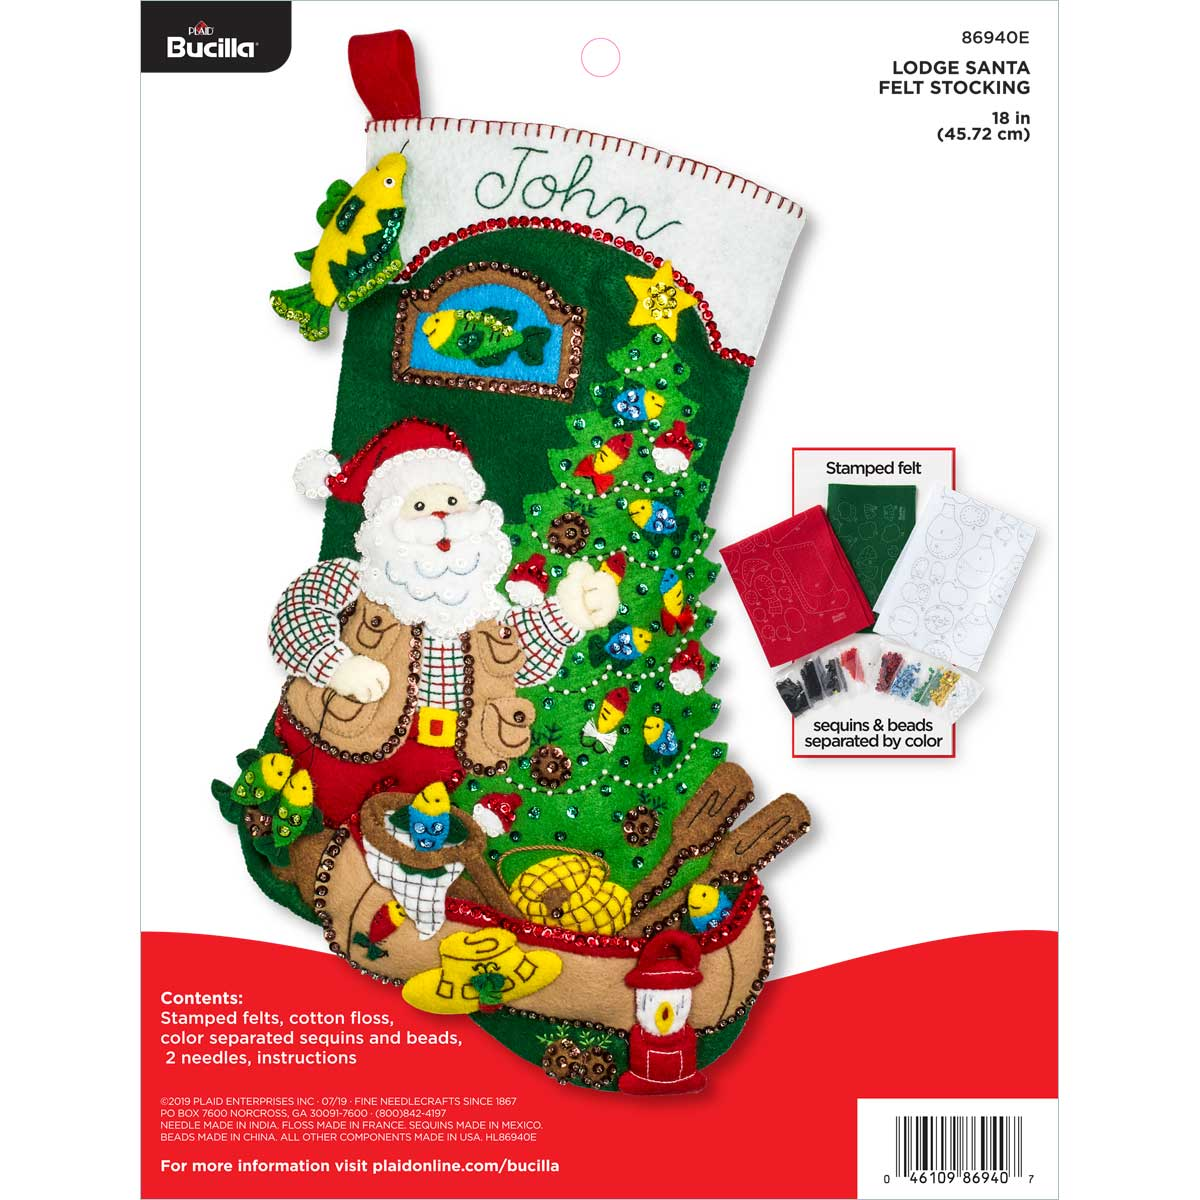 Bucilla ® Seasonal - Felt - Stocking Kits - Lodge Santa - 86940E